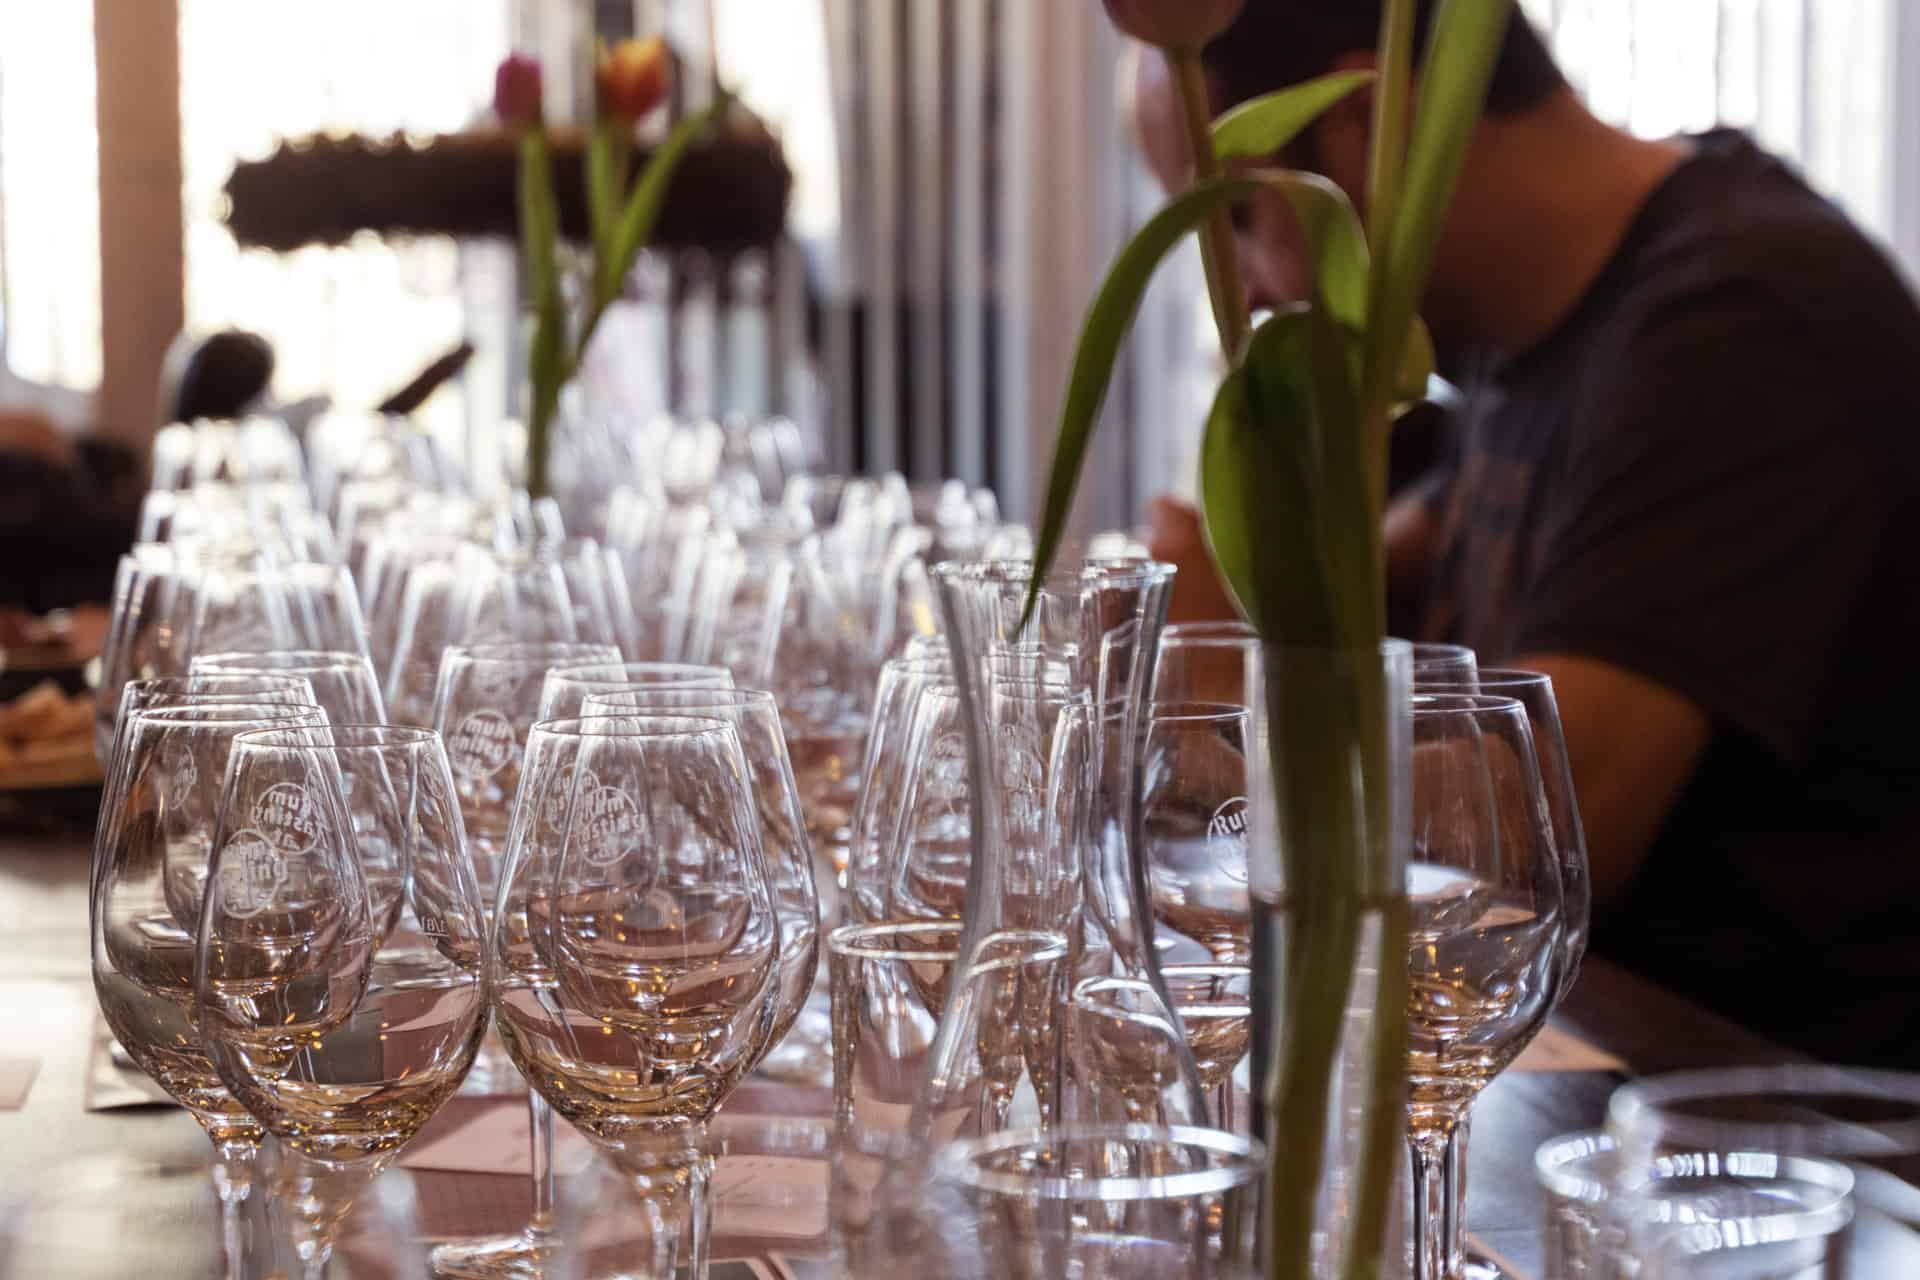 Rum Tasting Adi Matzek Grillschule Rum Gläser